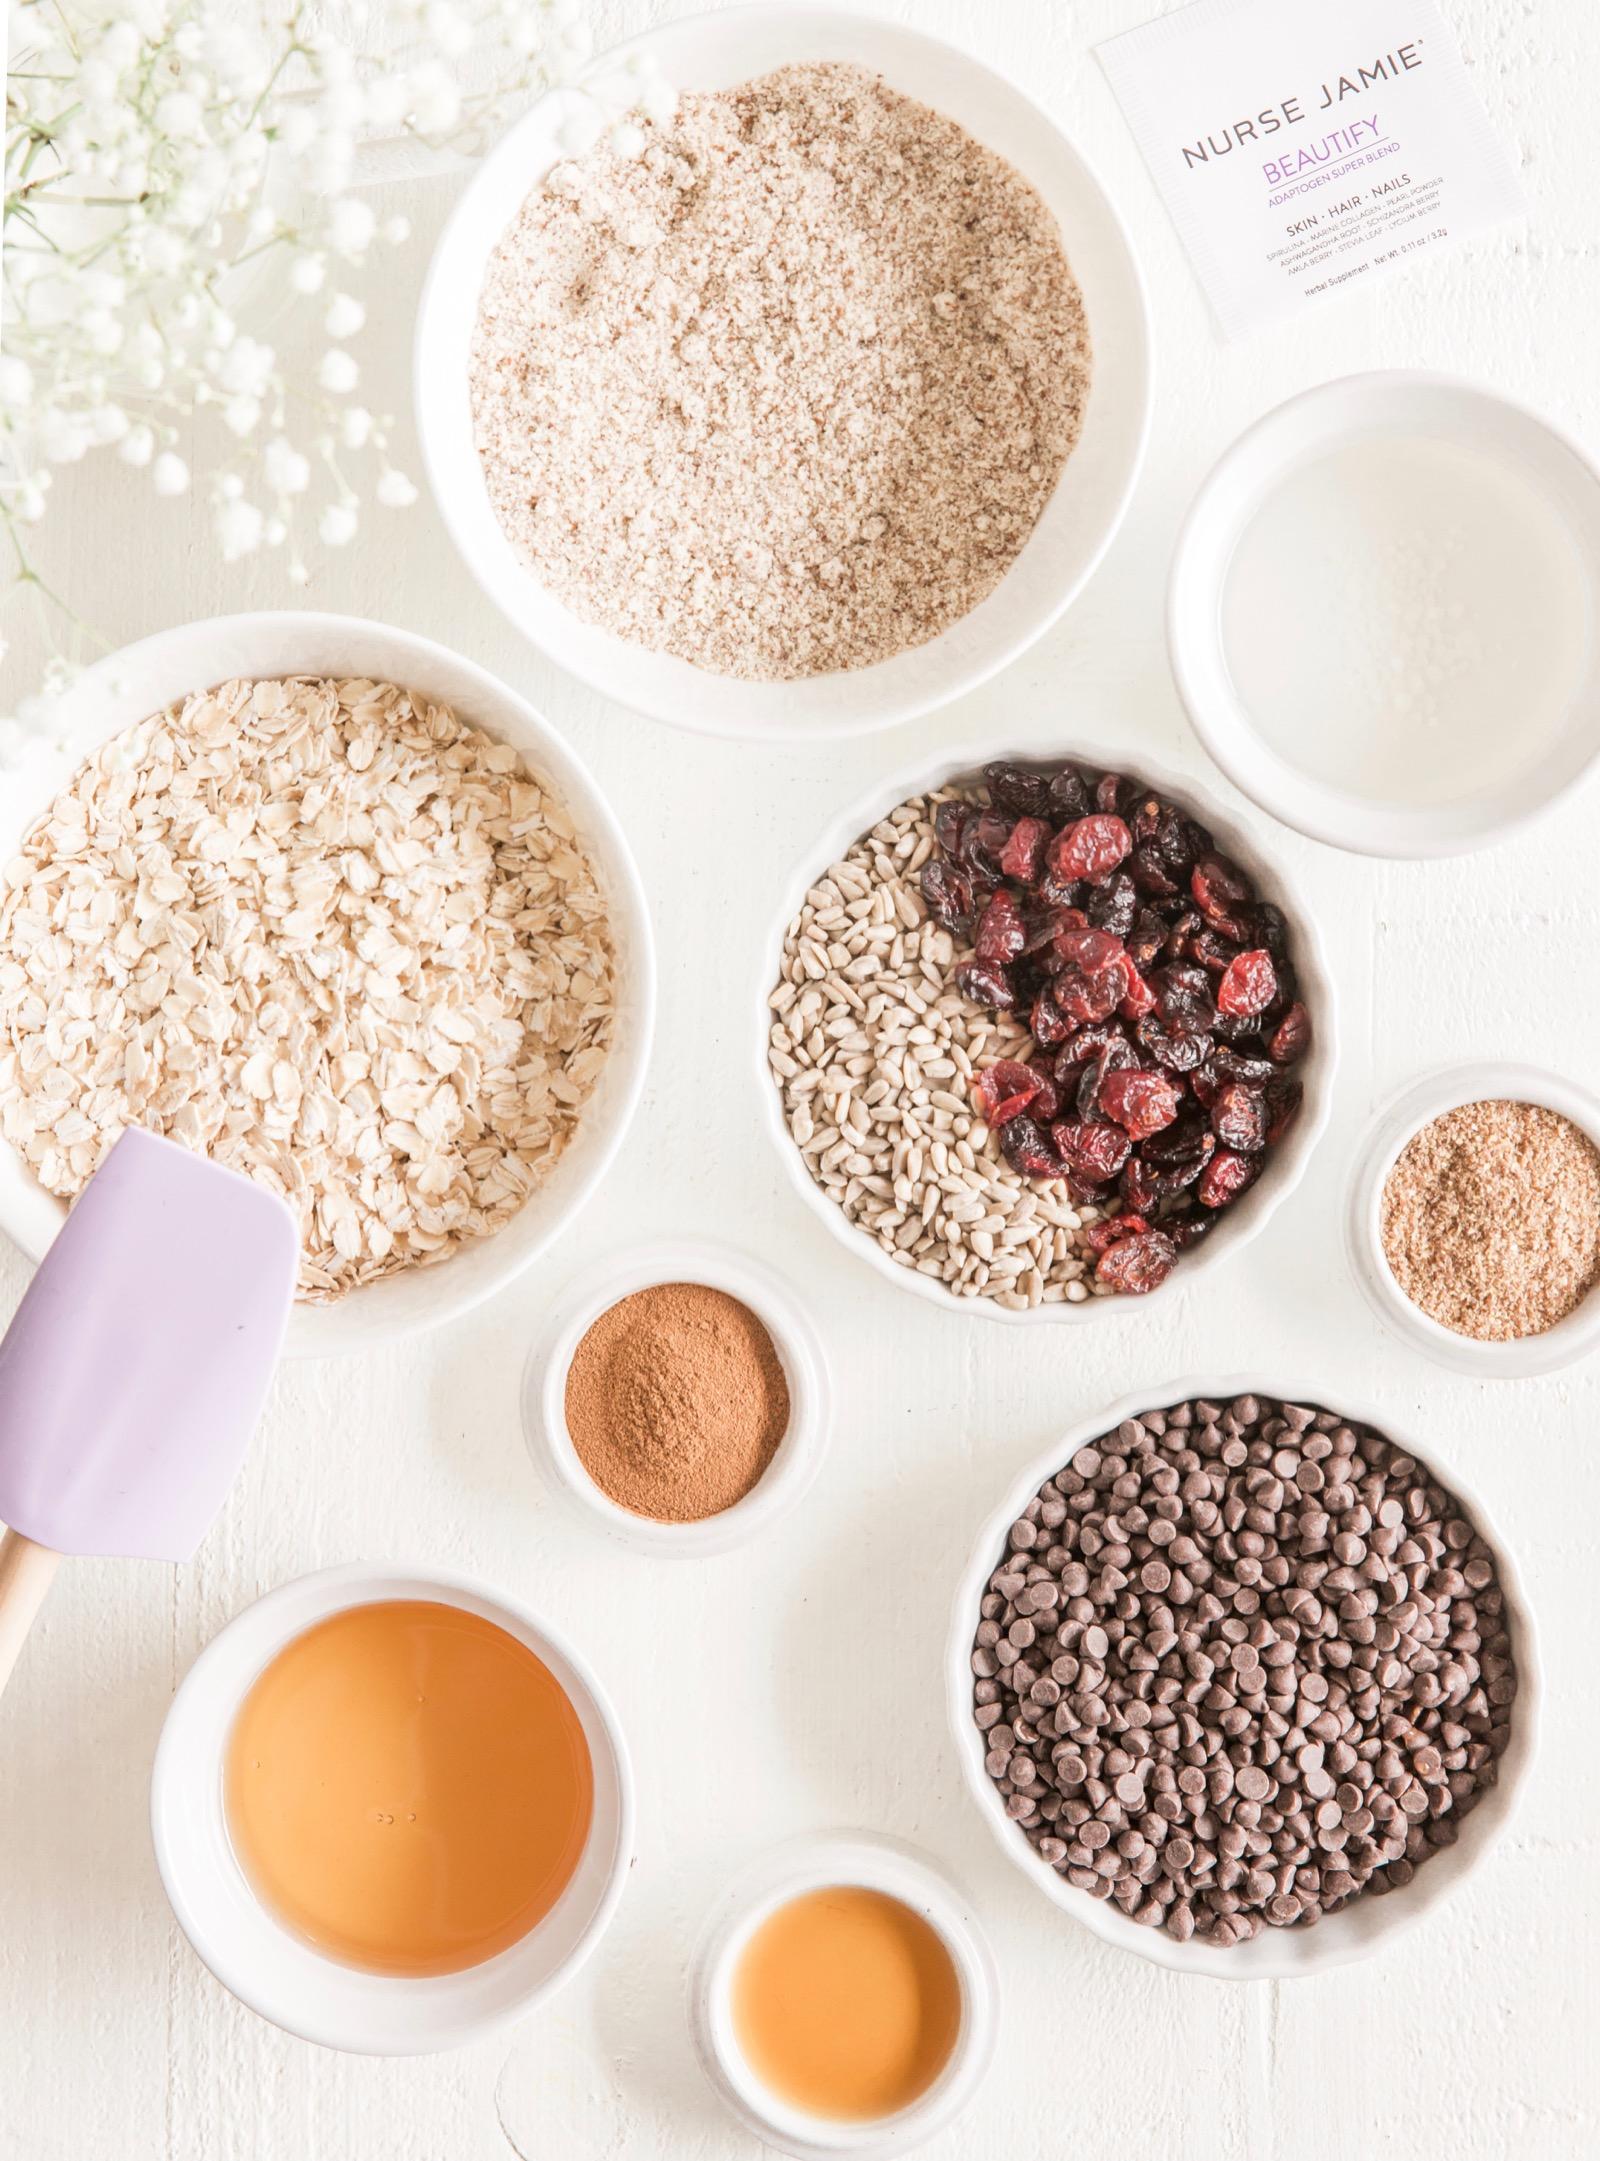 DIY Granola Bar Recipe